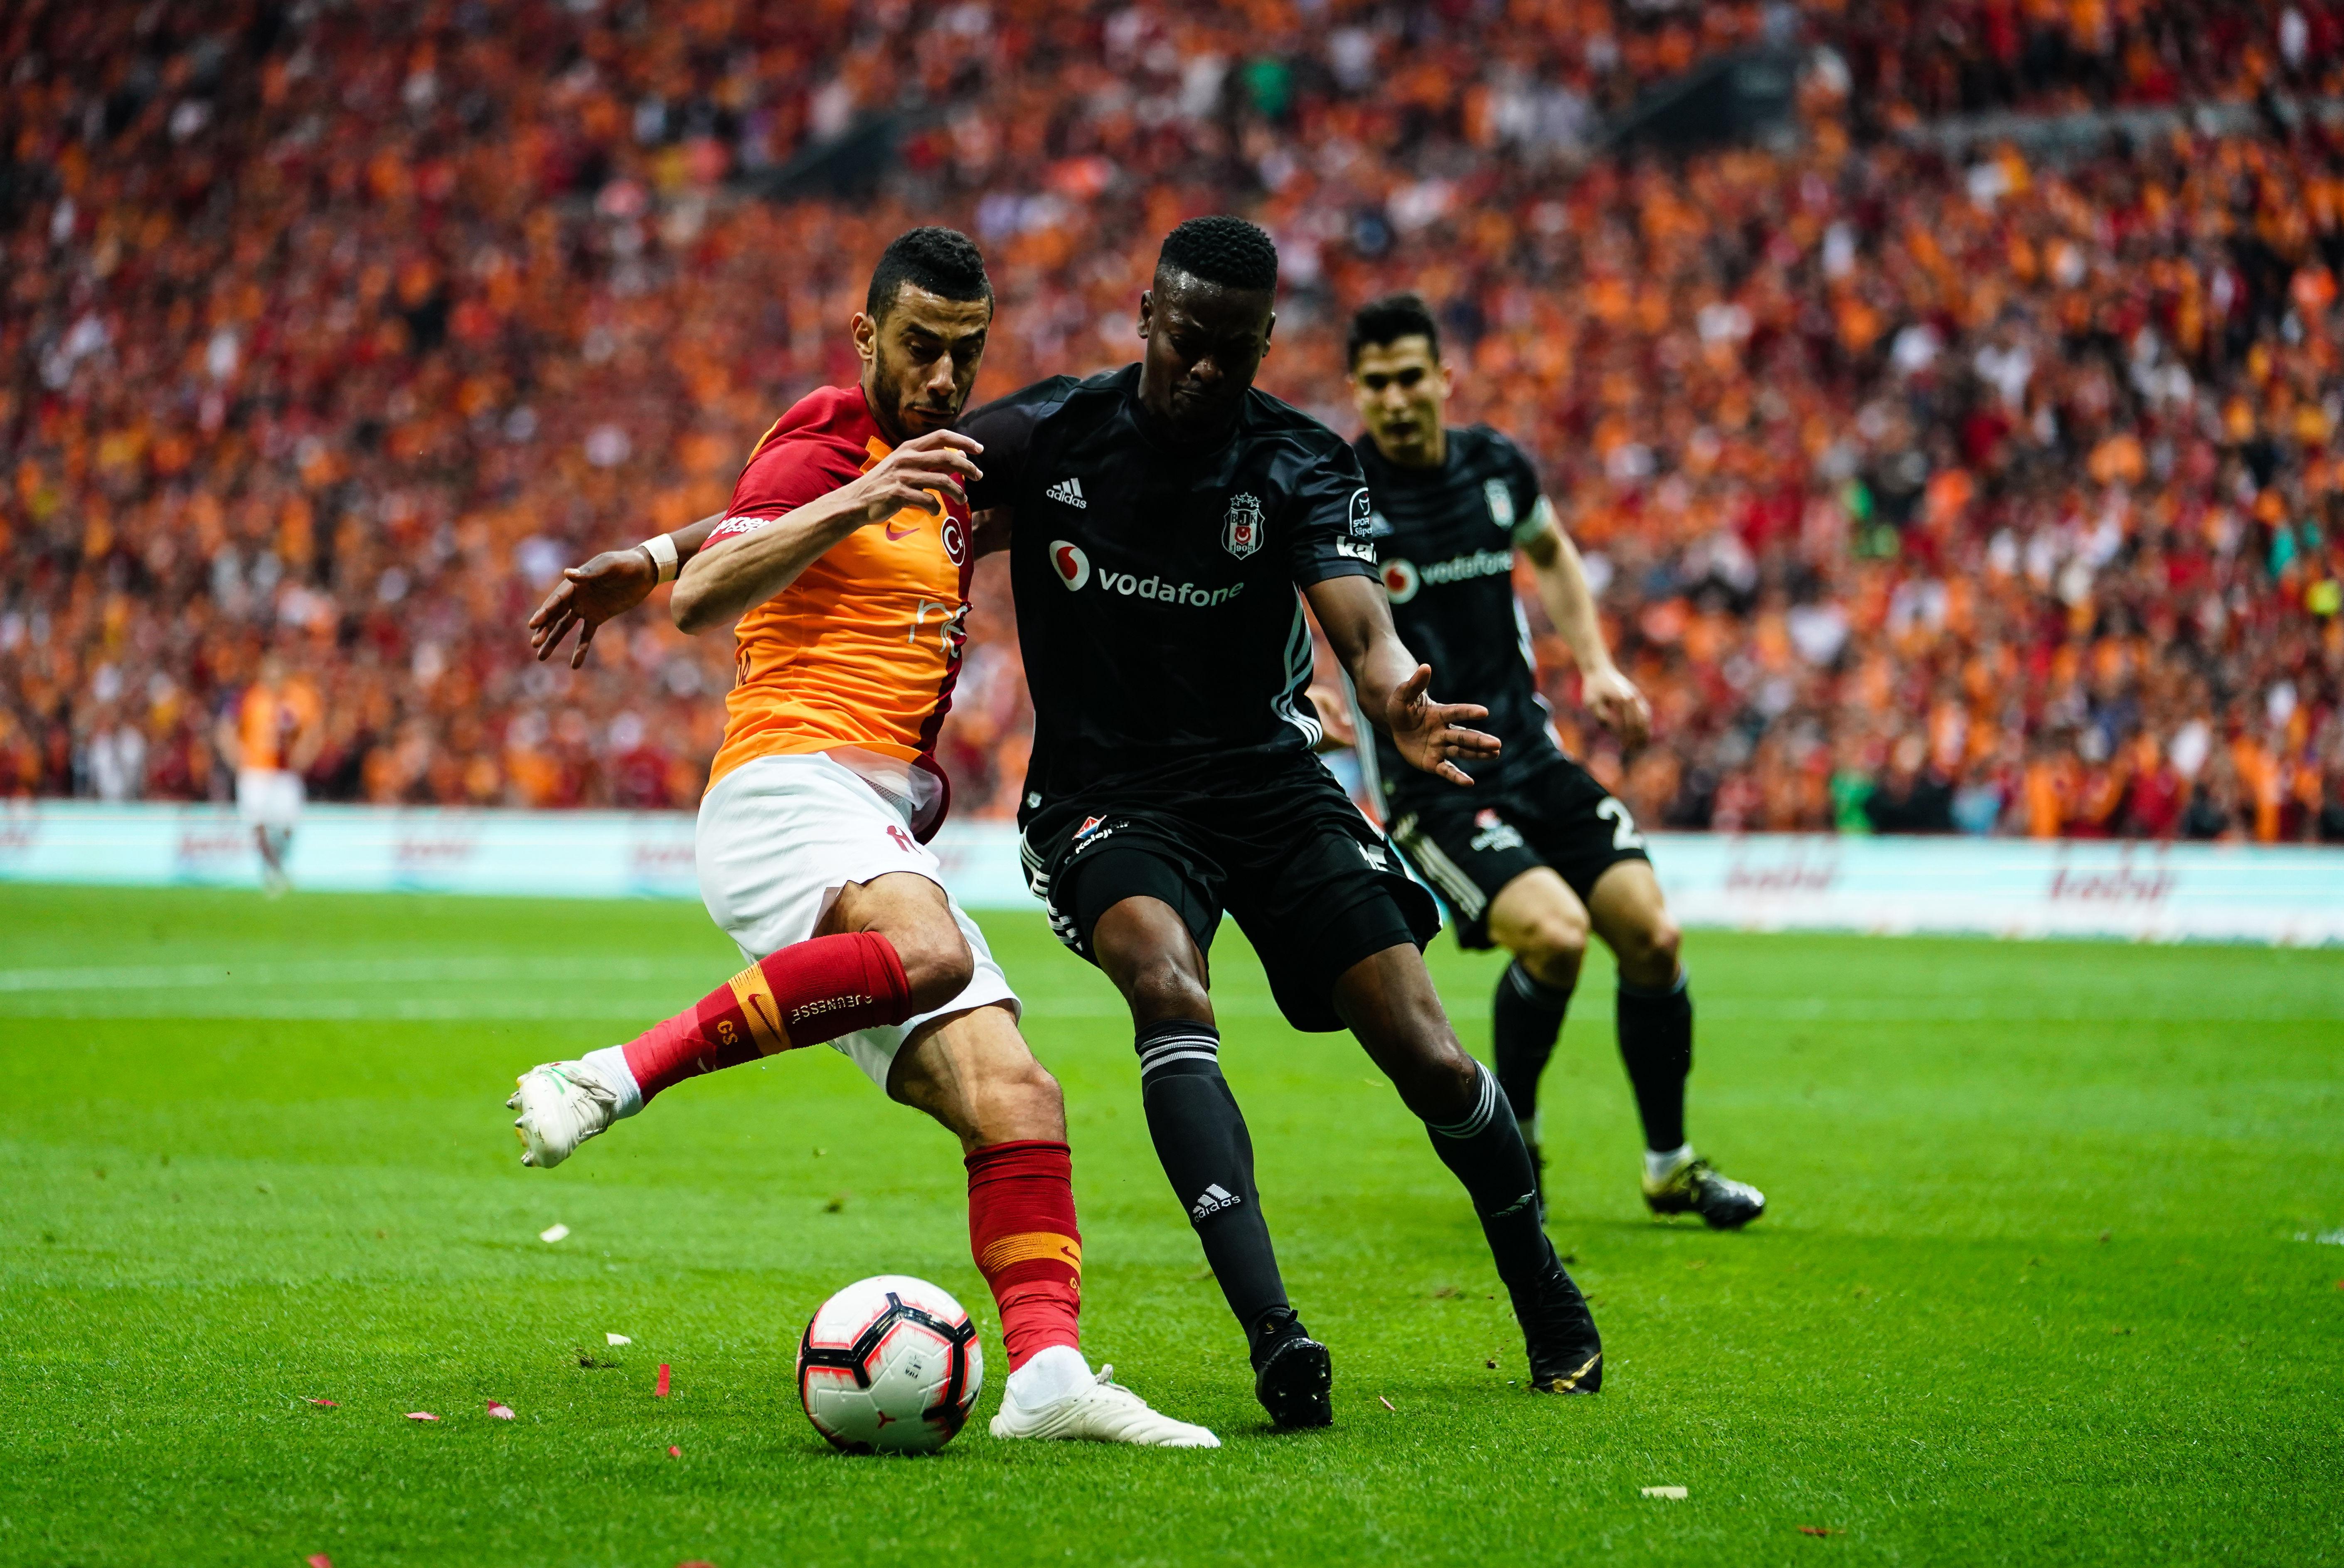 Galatasaray S.K. v Besiktas - Turkish Super Lig